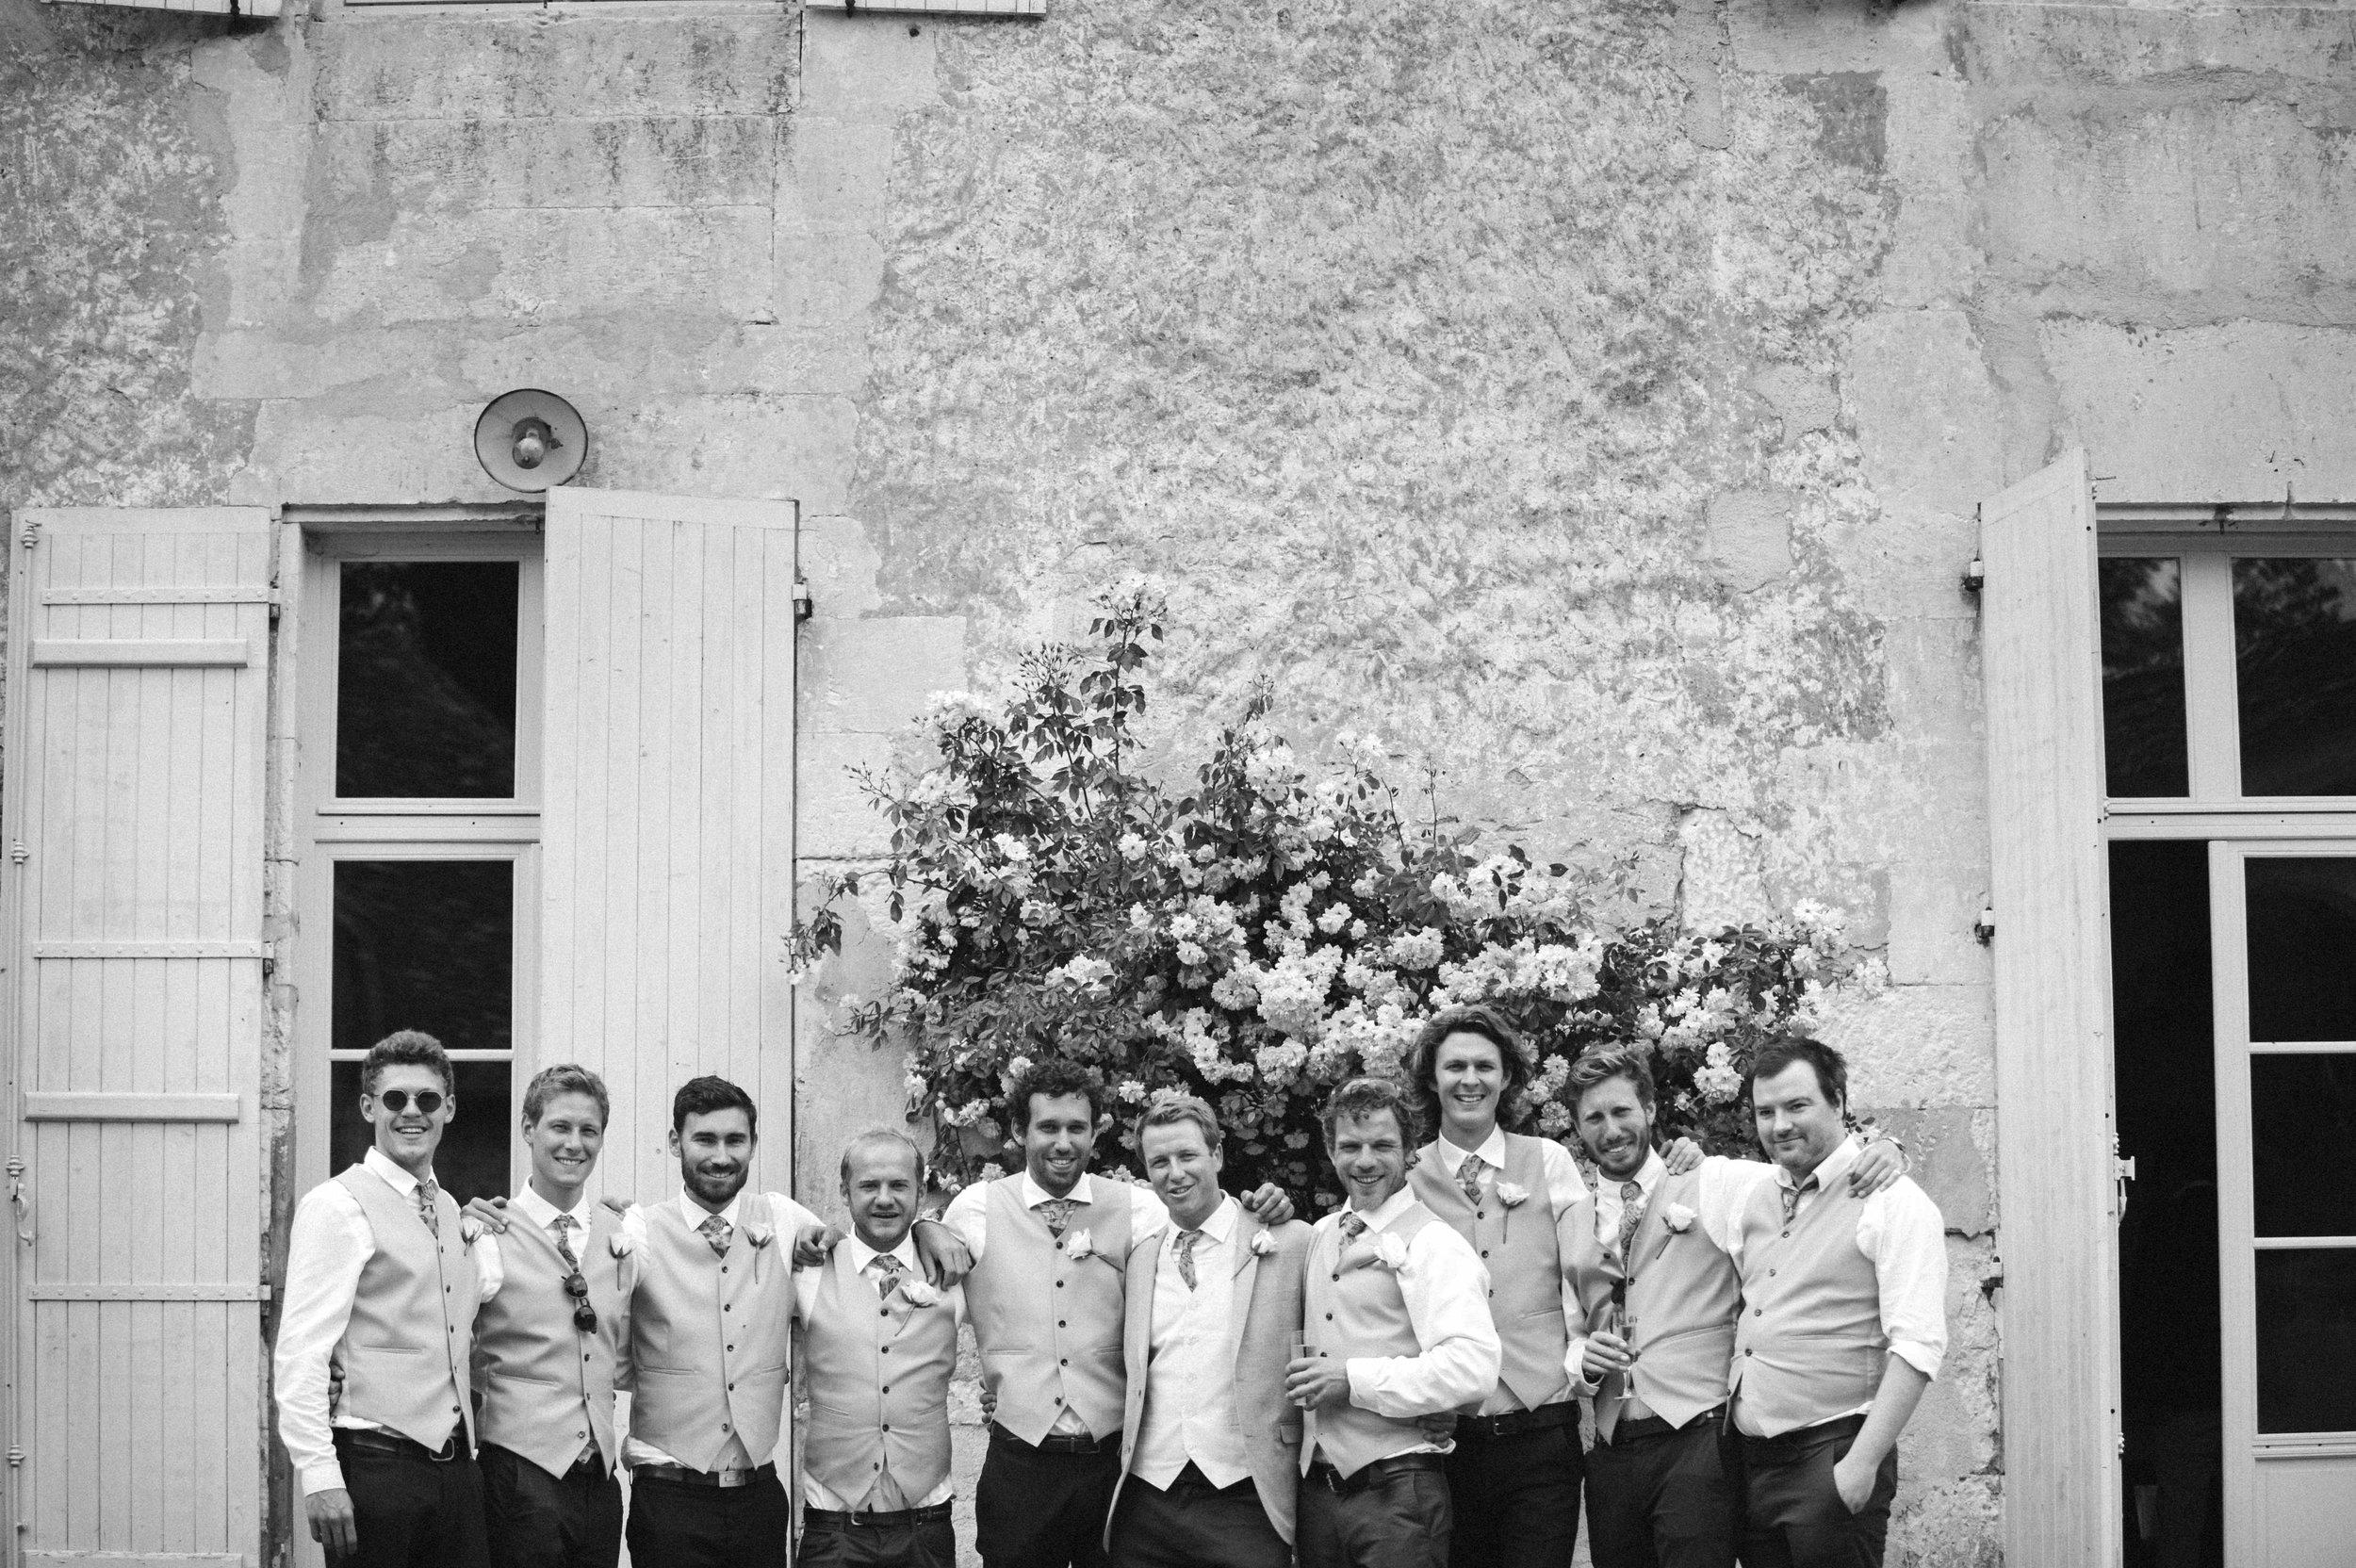 wedding-photographer-dordogne-mark-shaw-25.jpg